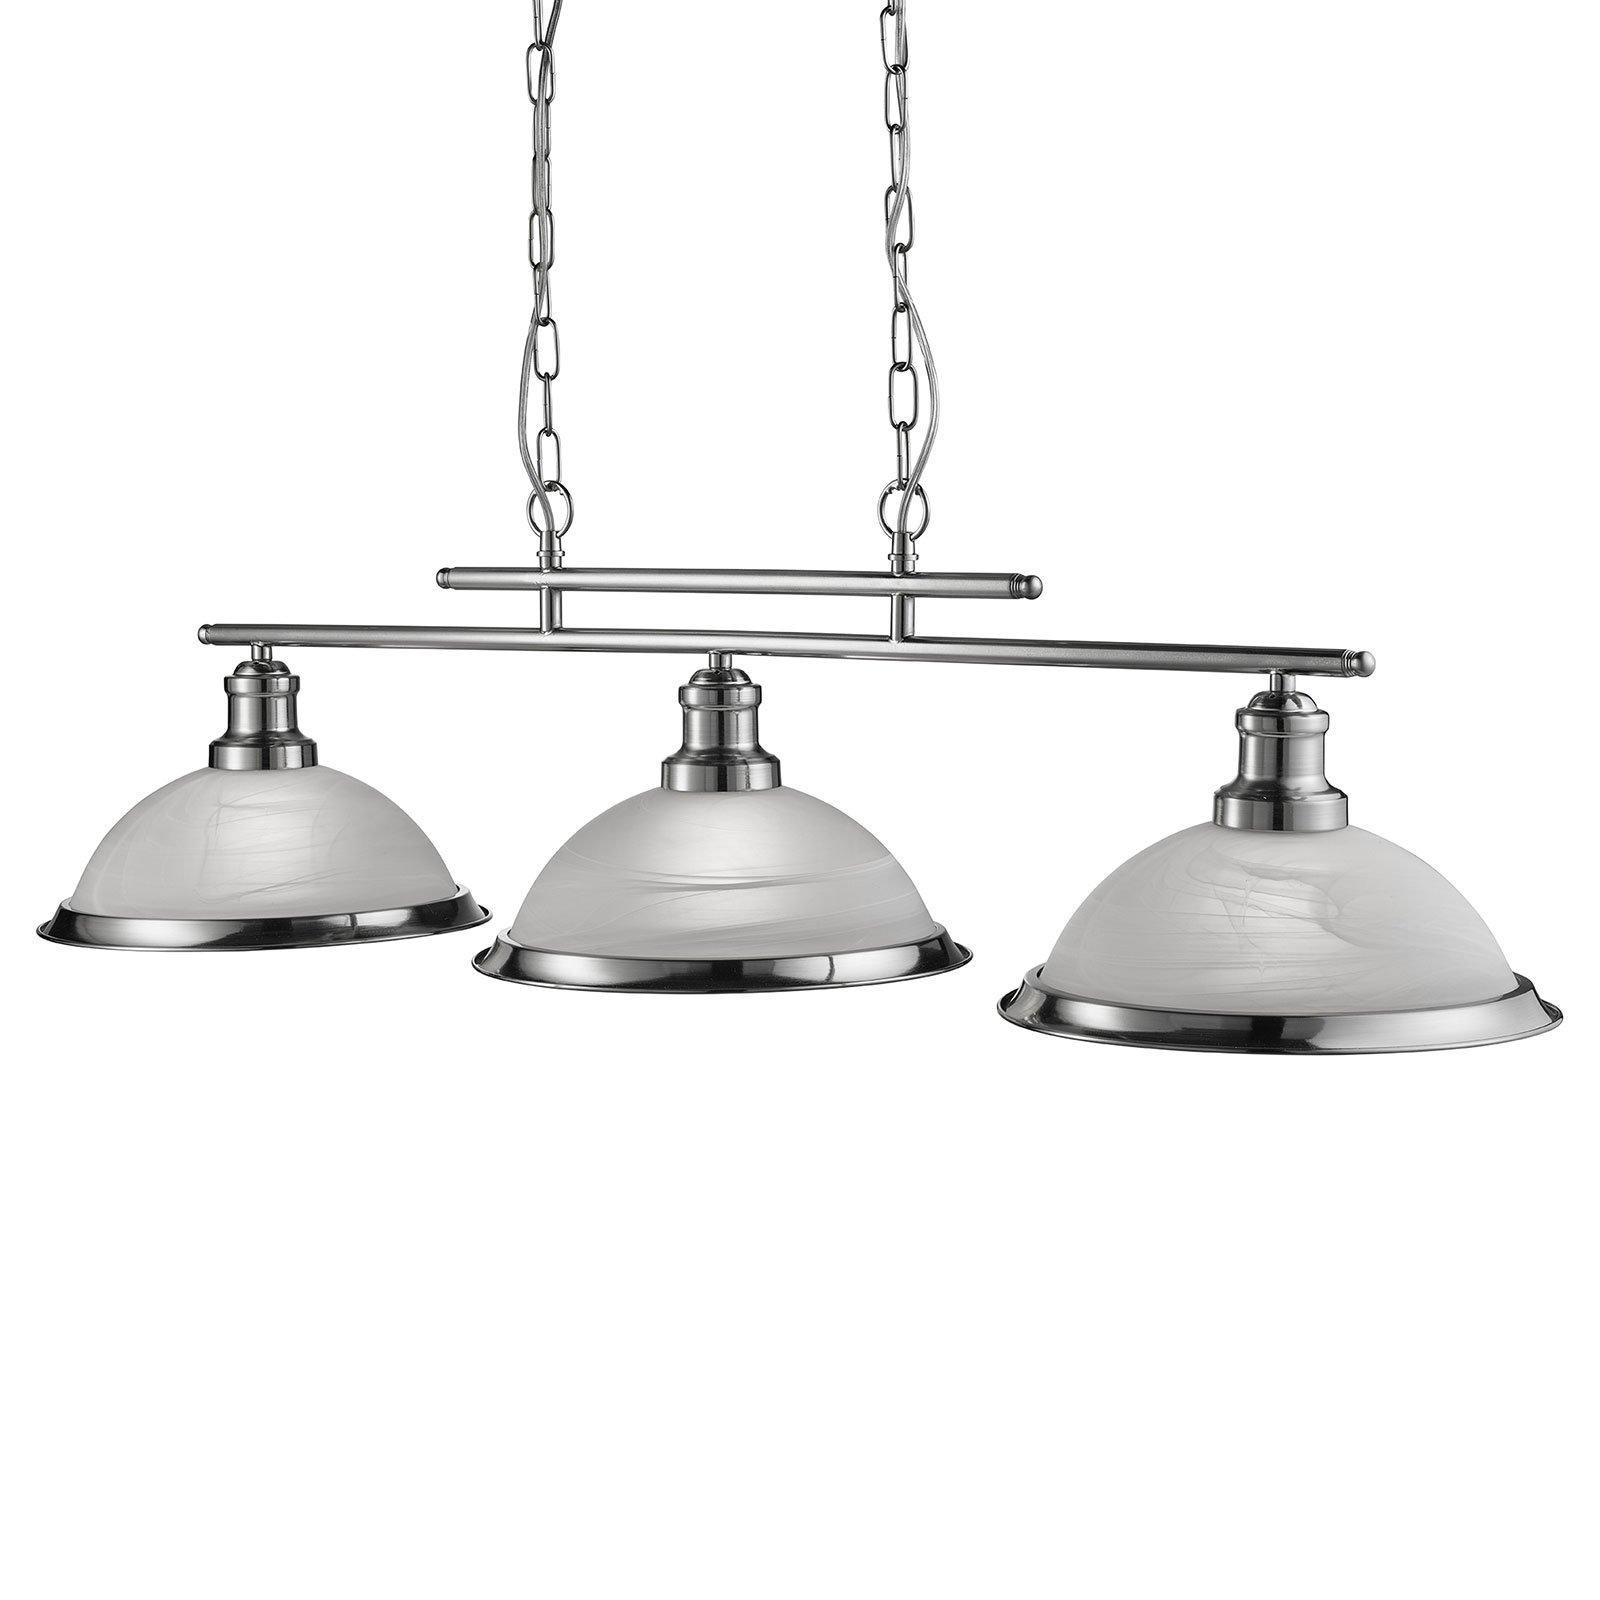 Hengelampe Bistro, 3 lyskilde, sølv